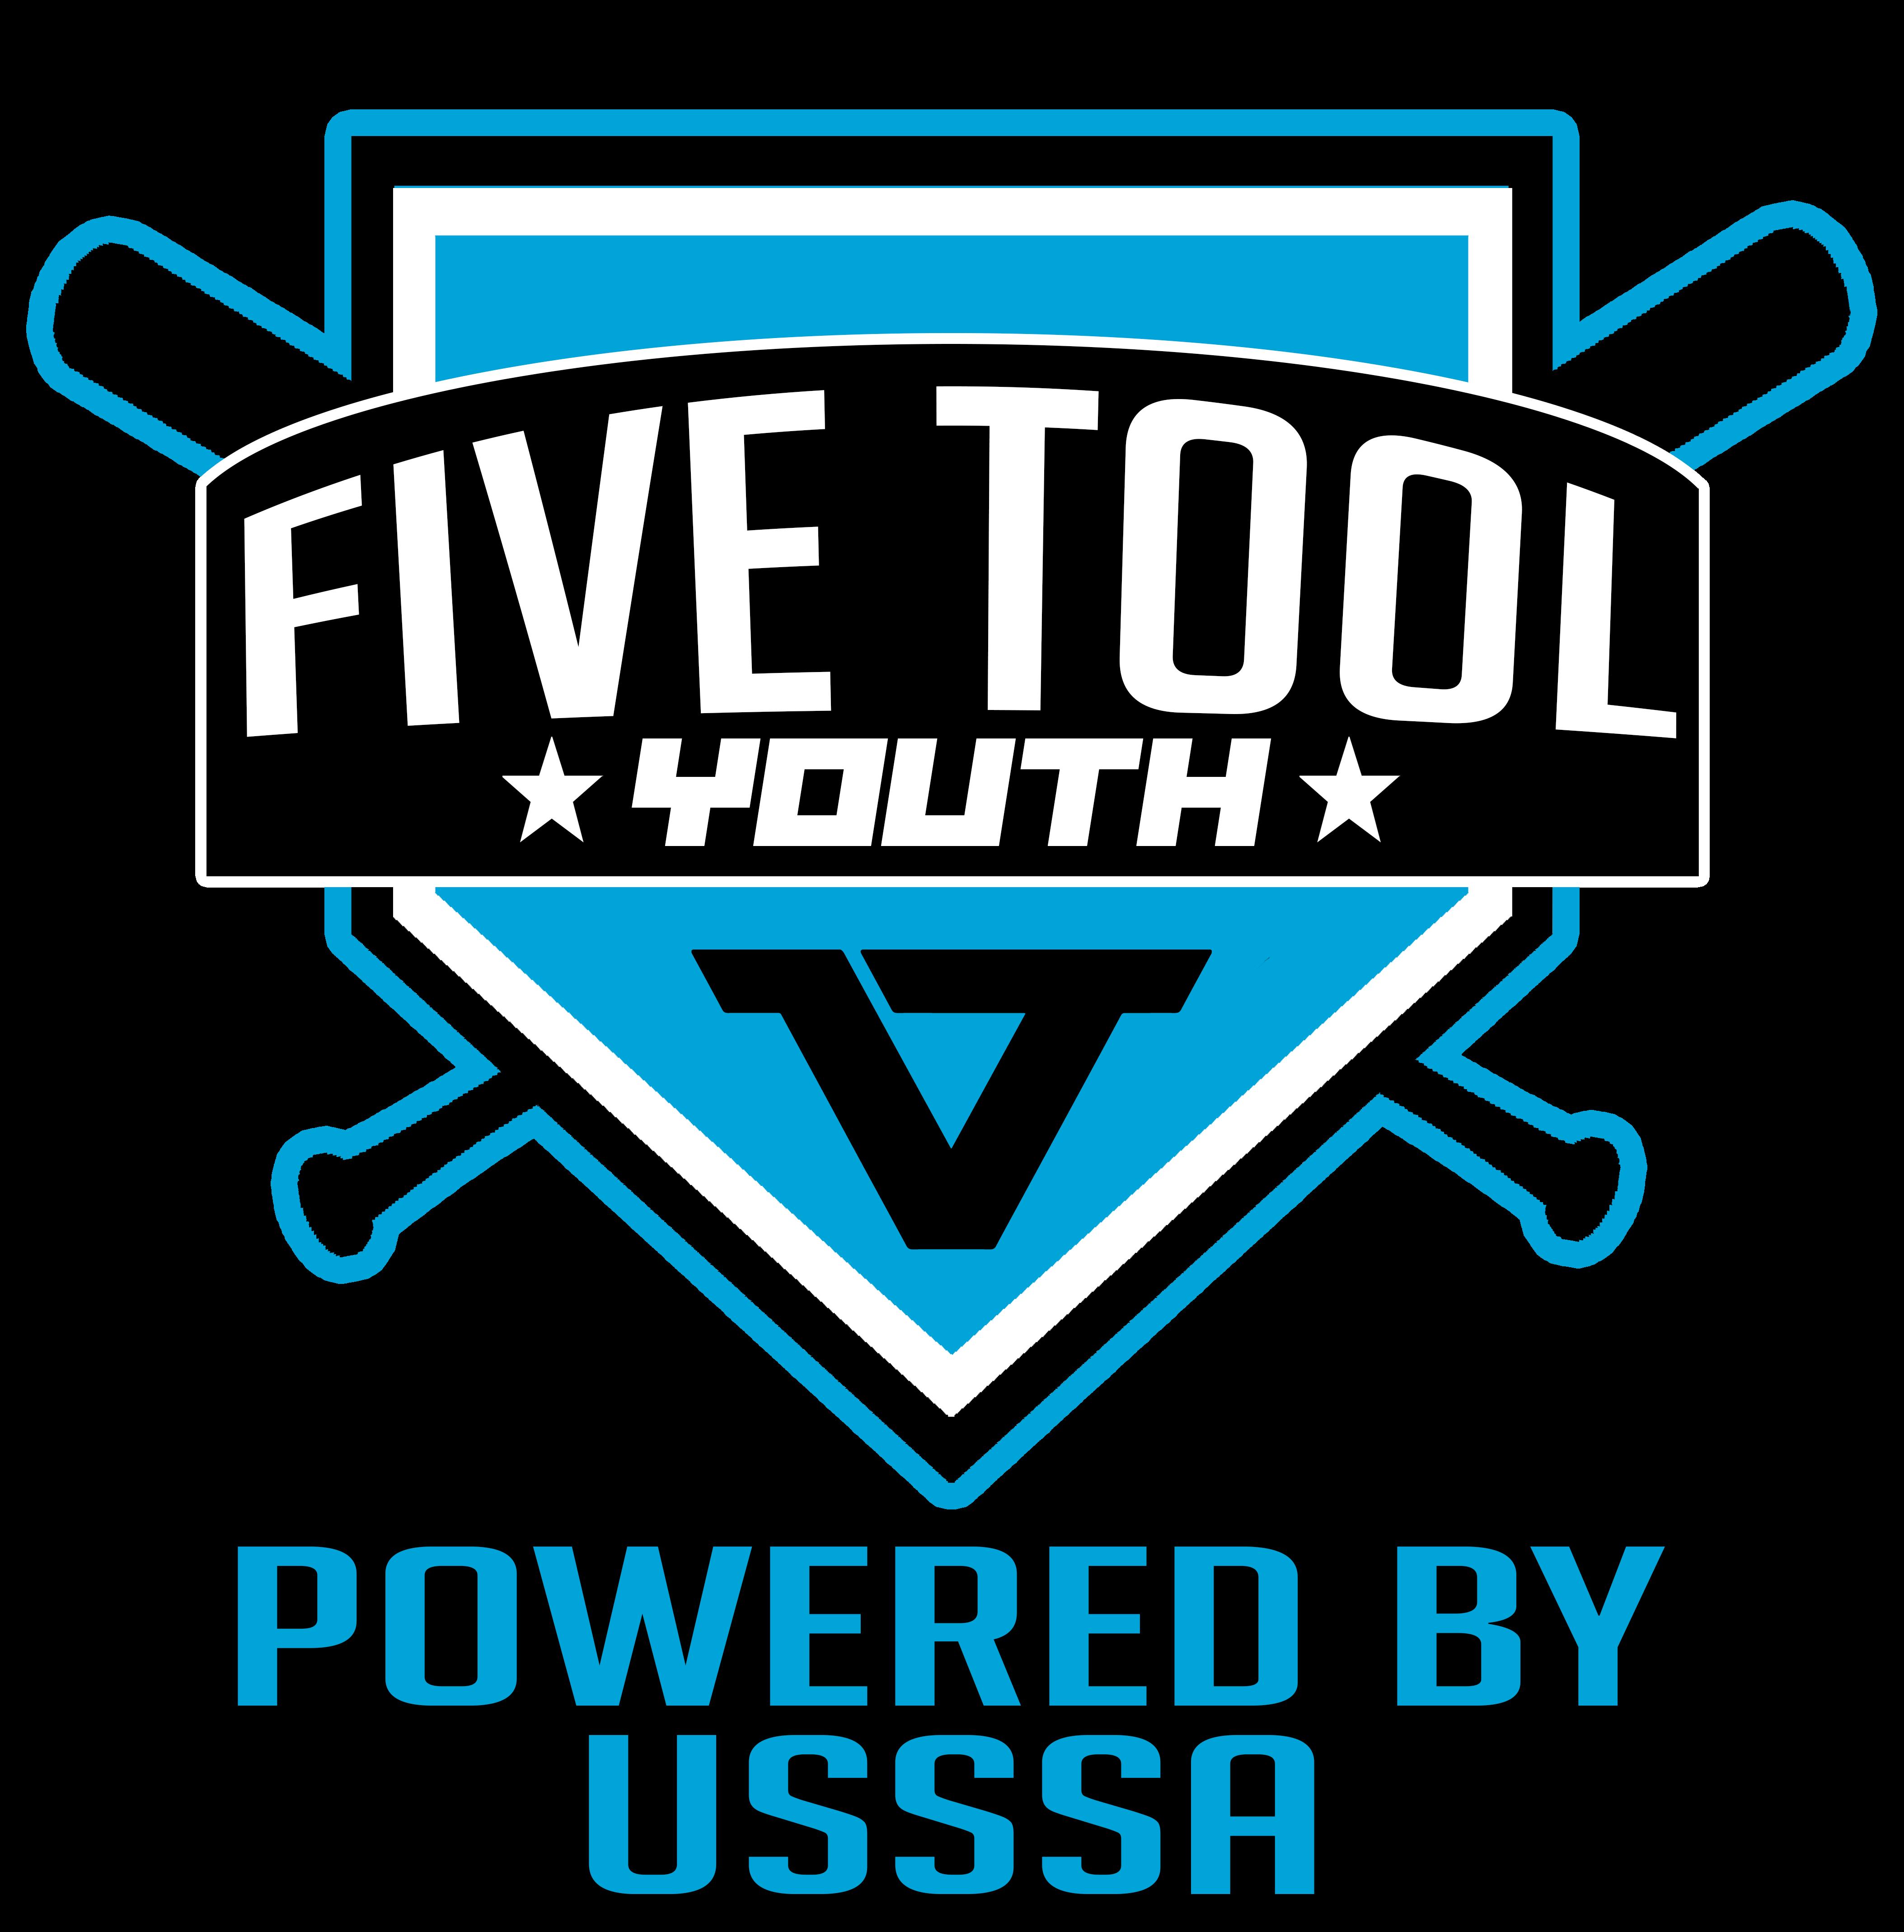 Five Tool Youth Southeast Texas Fall League